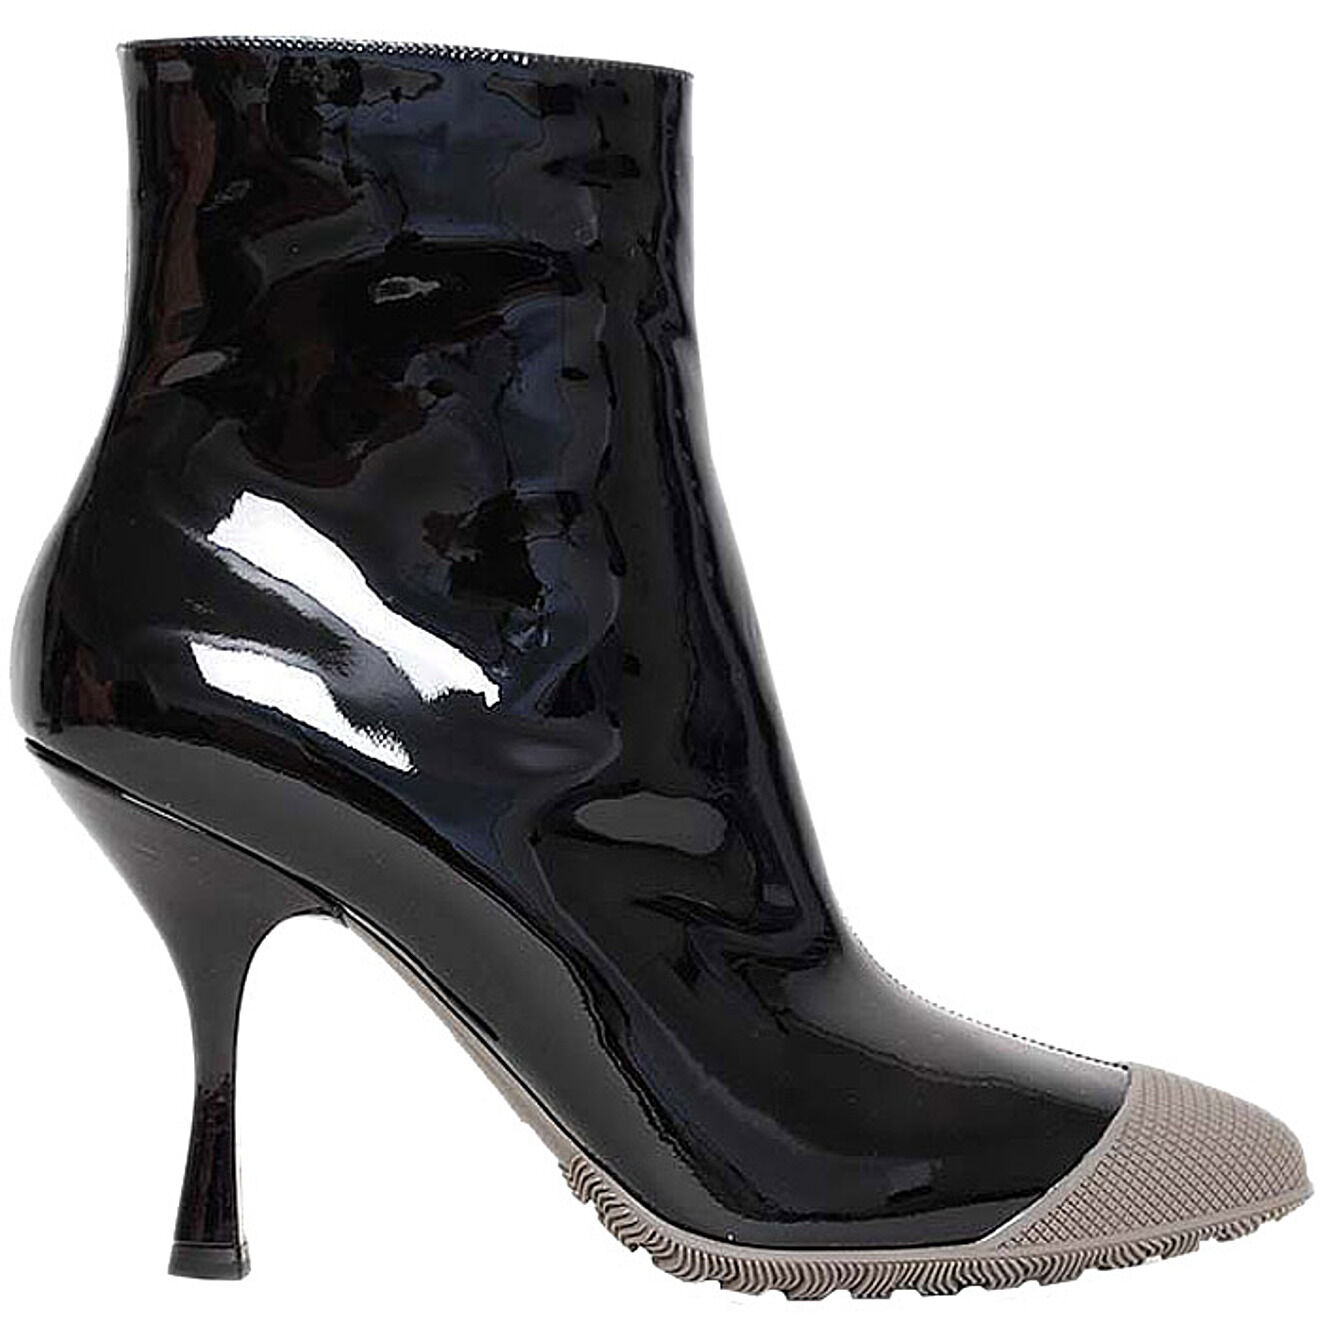 Casual salvaje Miu Miu heel ankle boots stivaletti + tg 37 grey + black nero + stivaletti grigio d5620d